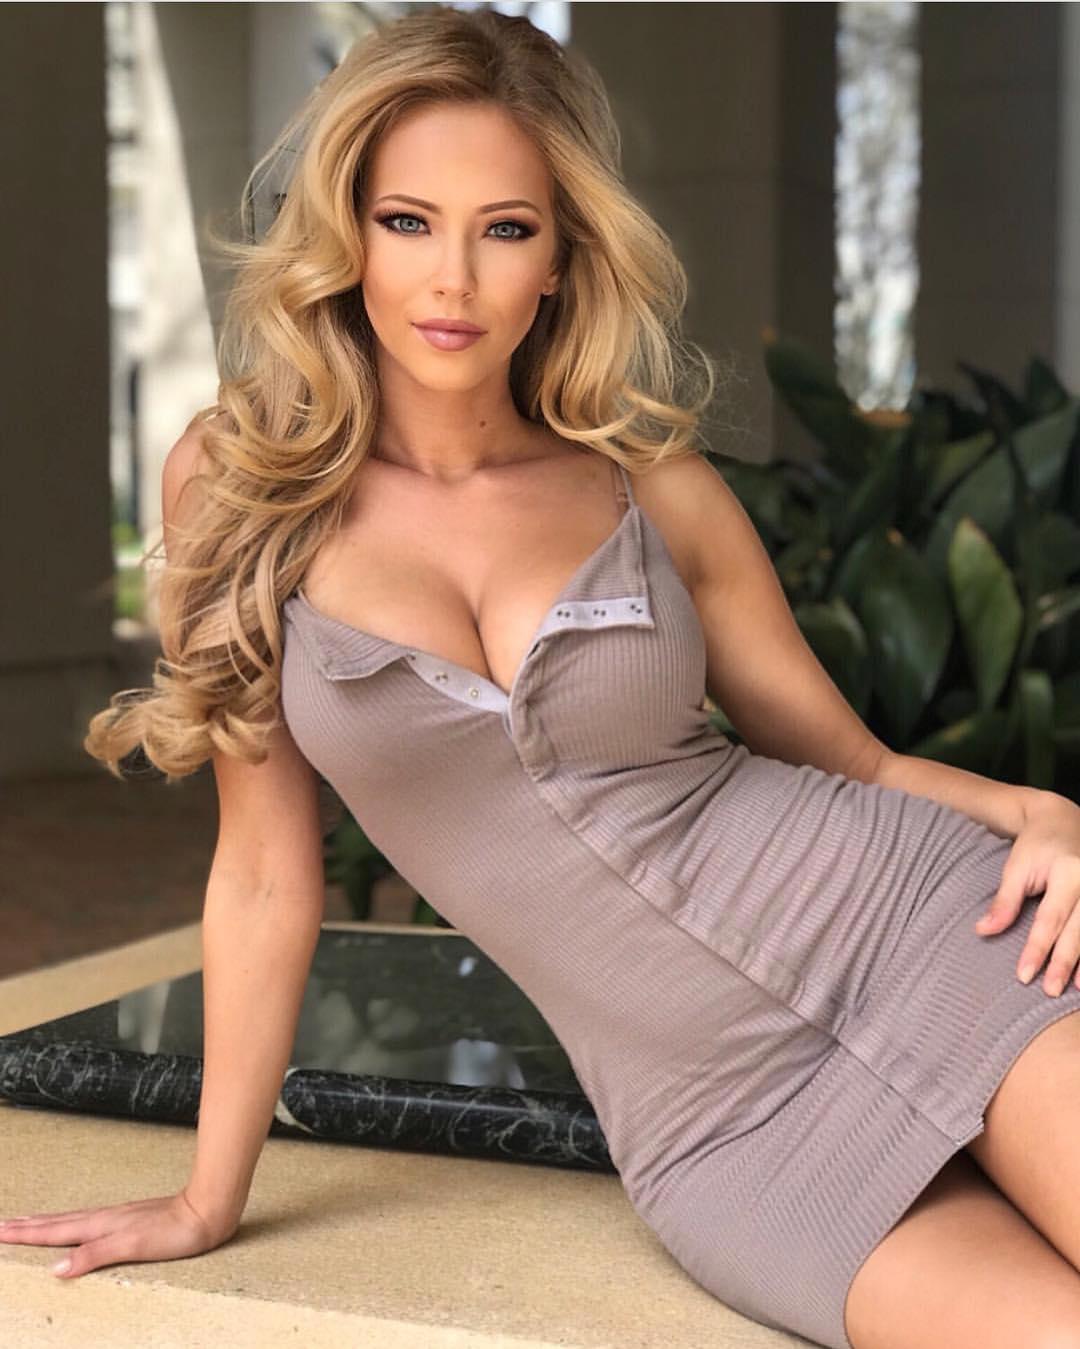 Beautiful Hot Women Gallery Sexy Wives